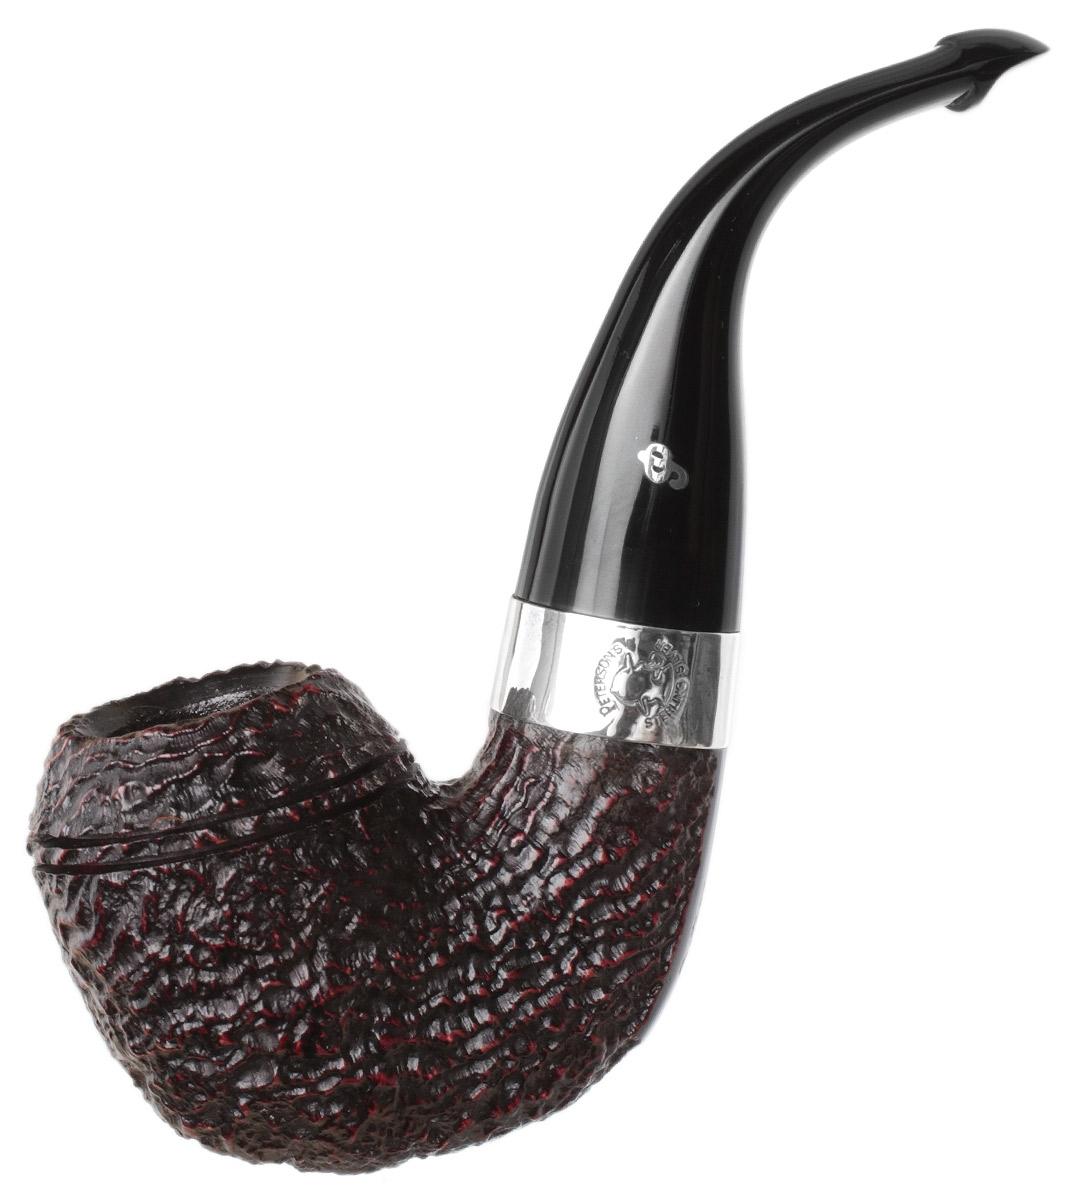 Sherlock Holmes PSB Baskerville P-Lip